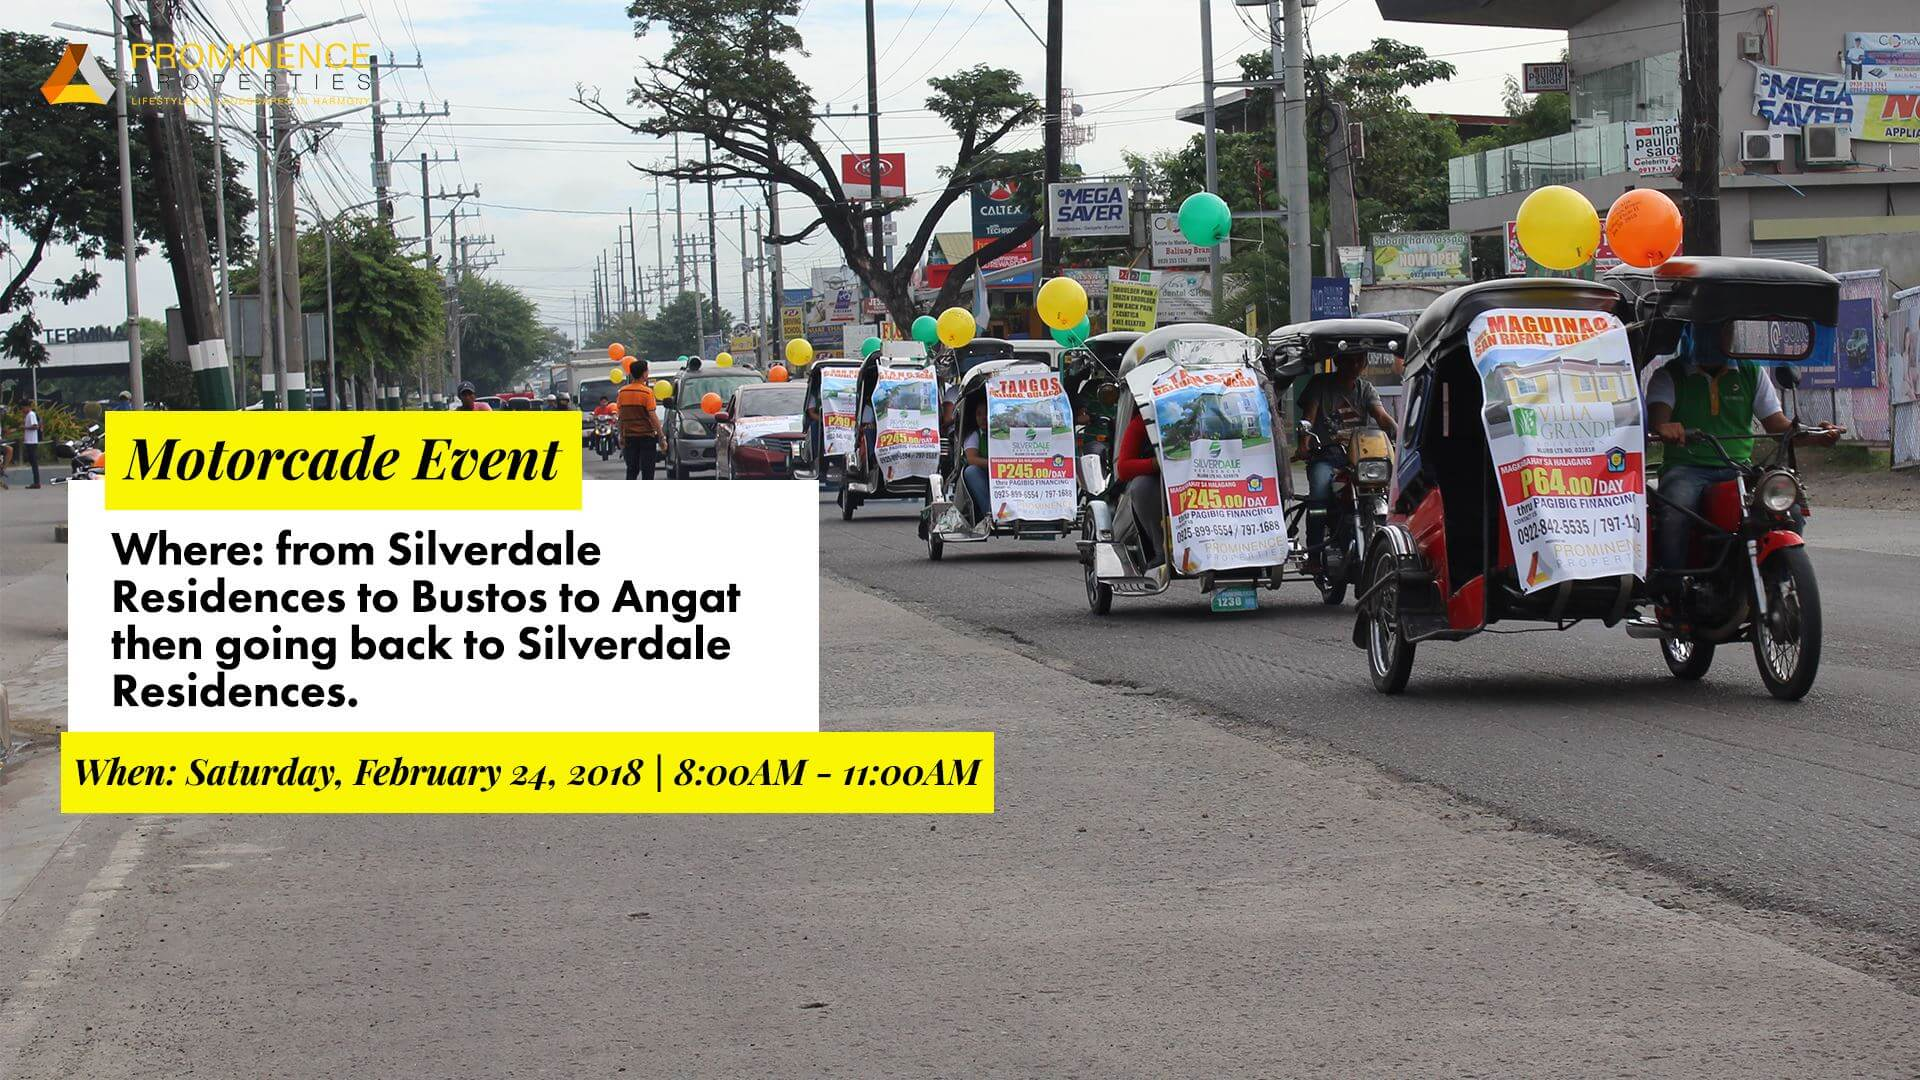 Motorcade Event (Baliuag-Bustos-Angat)